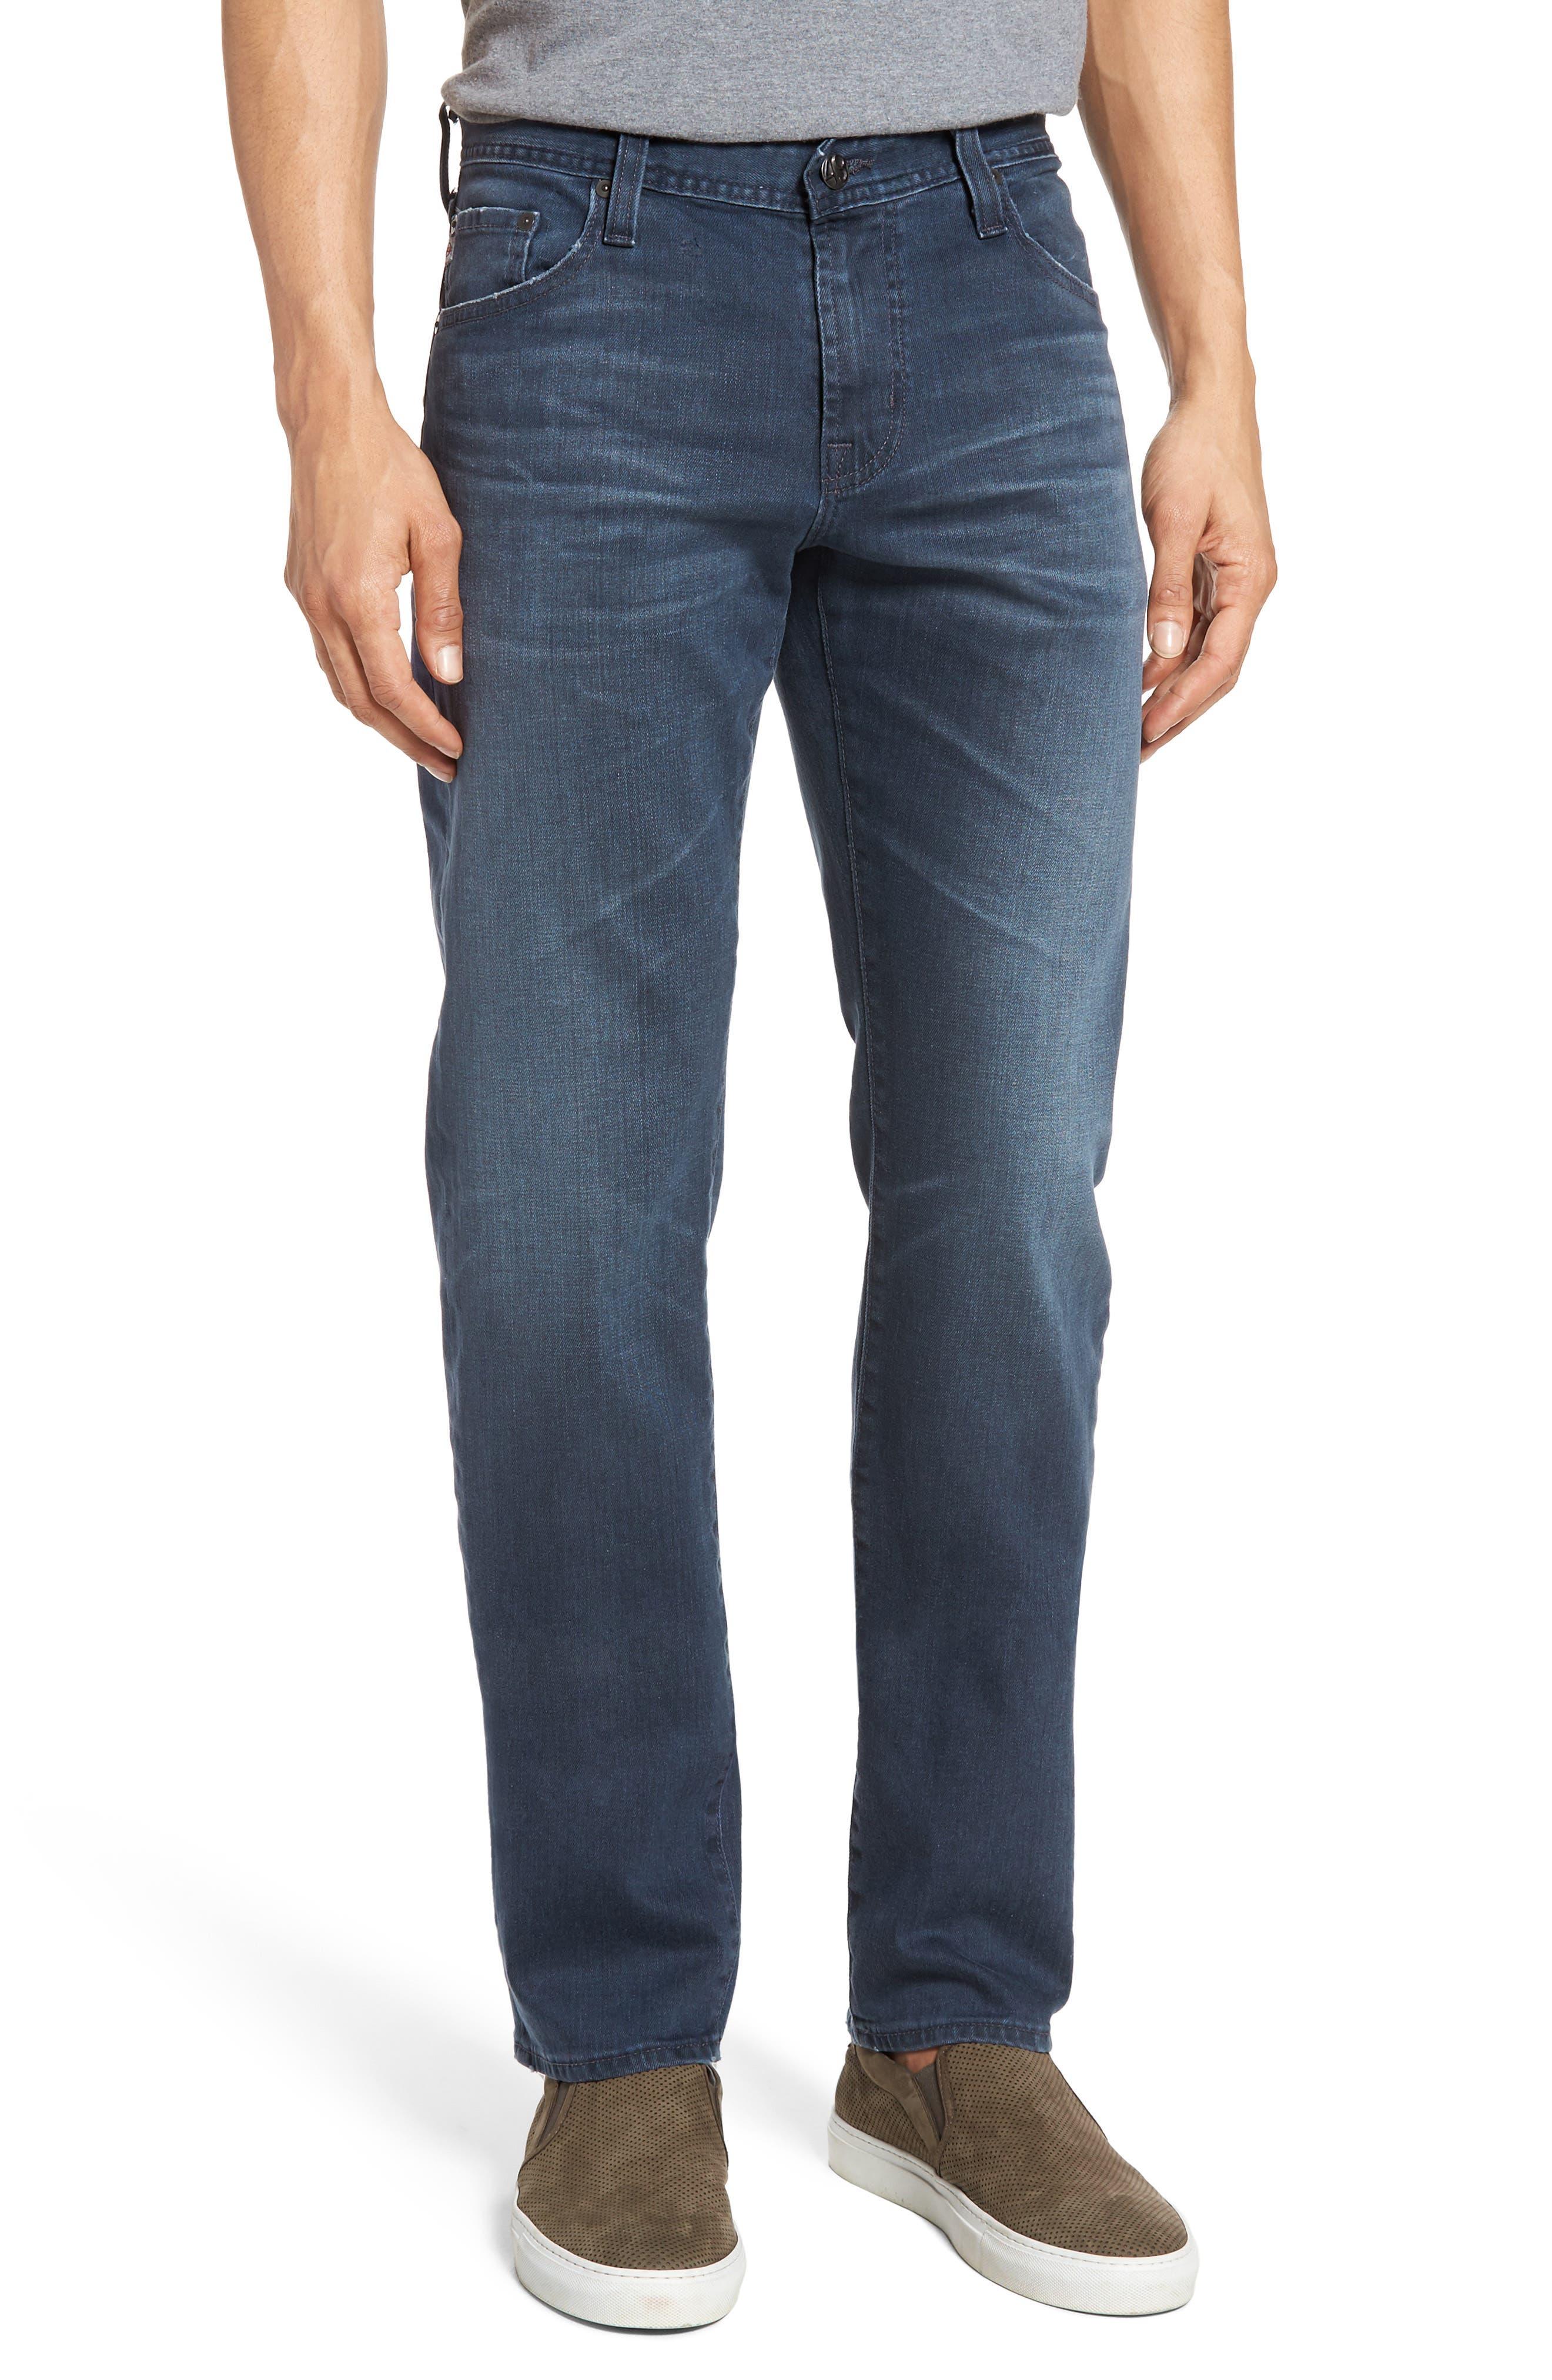 Graduate Slim Straight Leg Jeans,                             Main thumbnail 1, color,                             7 YEARS BLUE PERIL